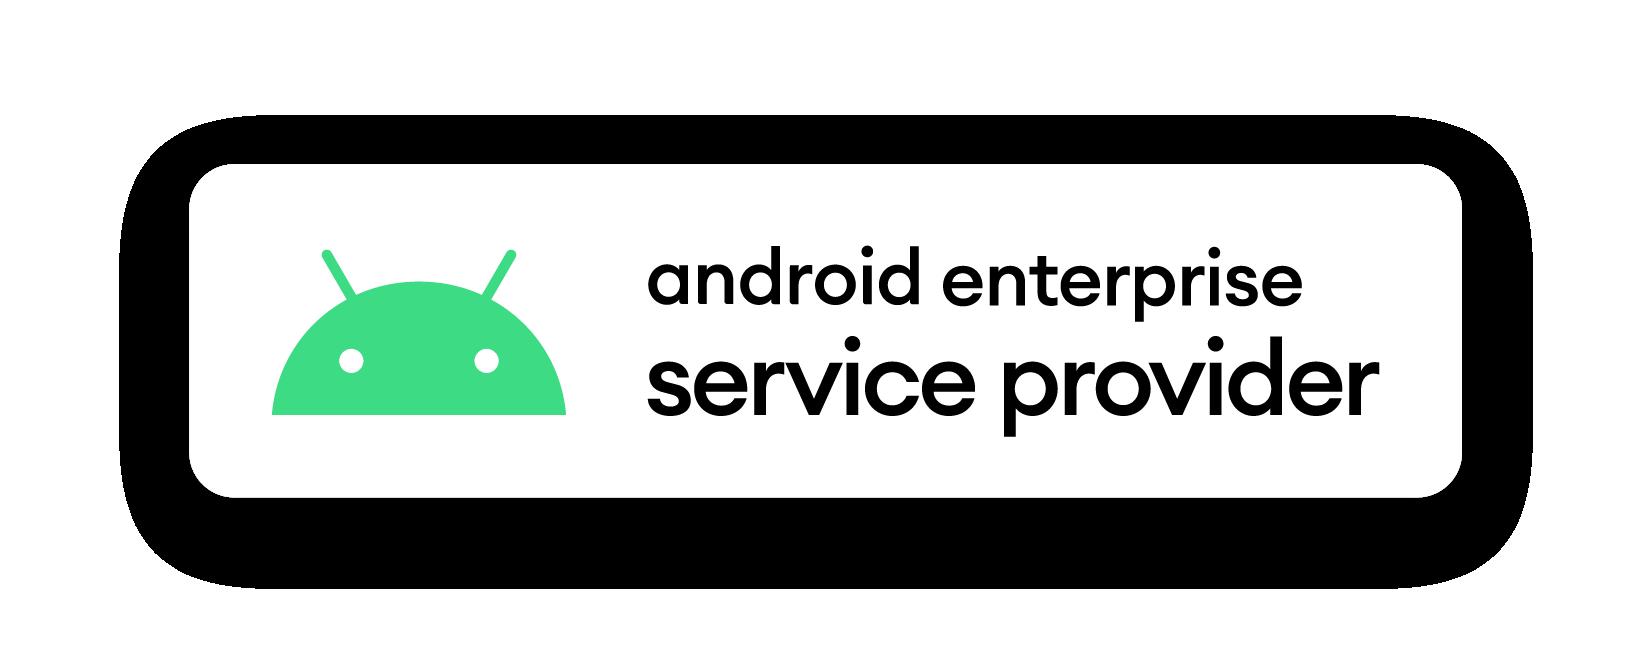 Android Enterprise Service Provider